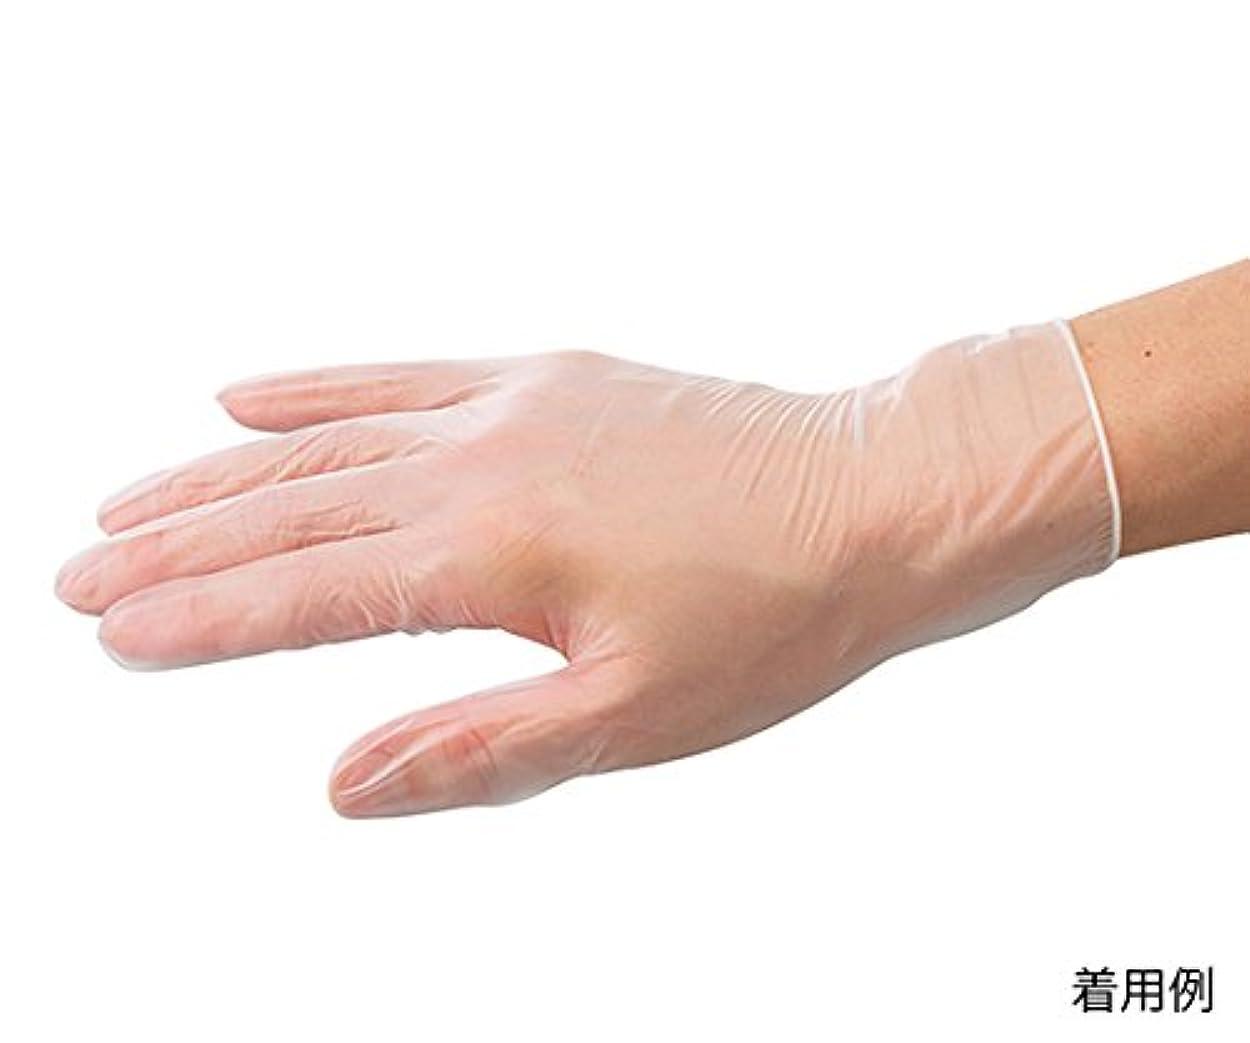 ARメディコム?インク?アジアリミテッド7-3726-02バイタルプラスチック手袋(パウダーフリー)M150枚入